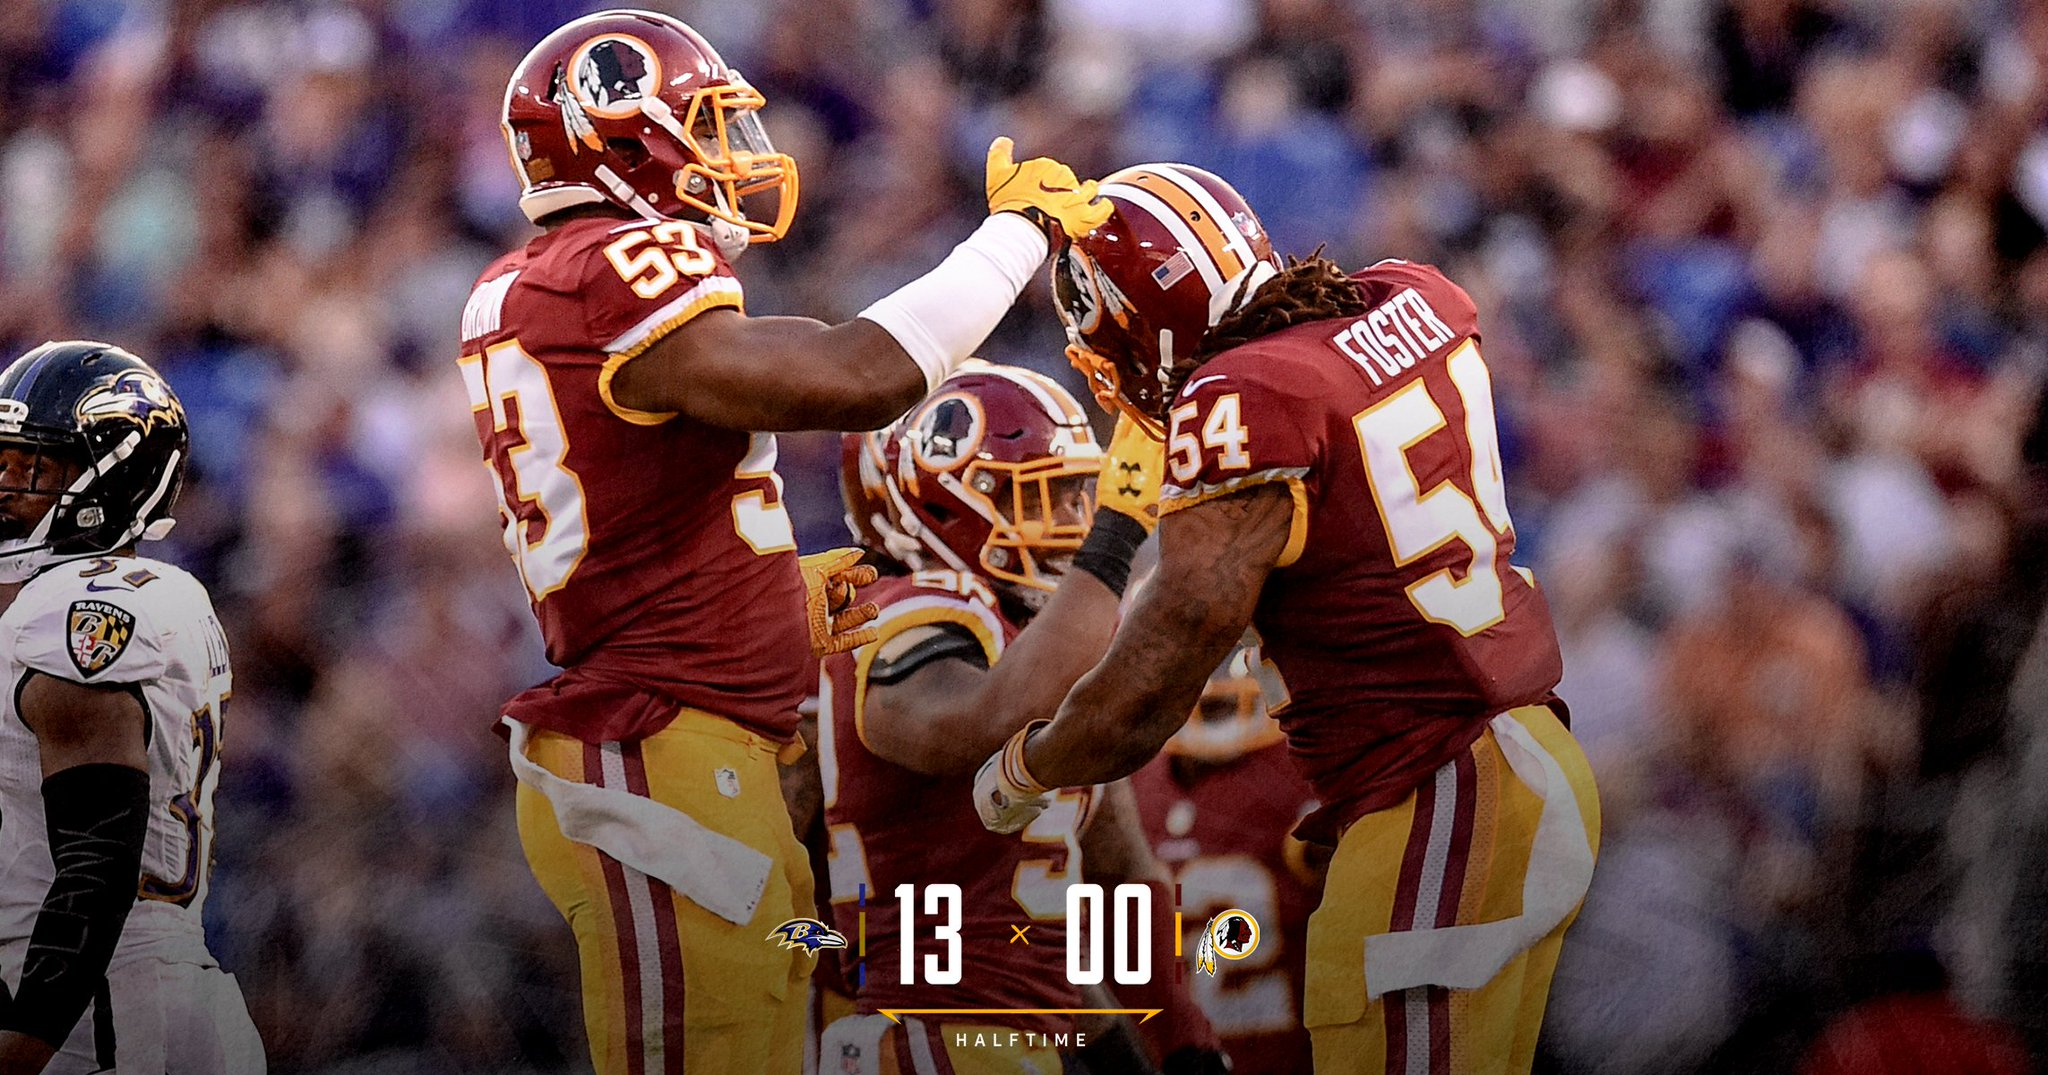 #Redskins trail Ravens through two quarters of #WASvsBAL.  ��: https://t.co/8iWWEs3luW https://t.co/ARoLS3TOLP